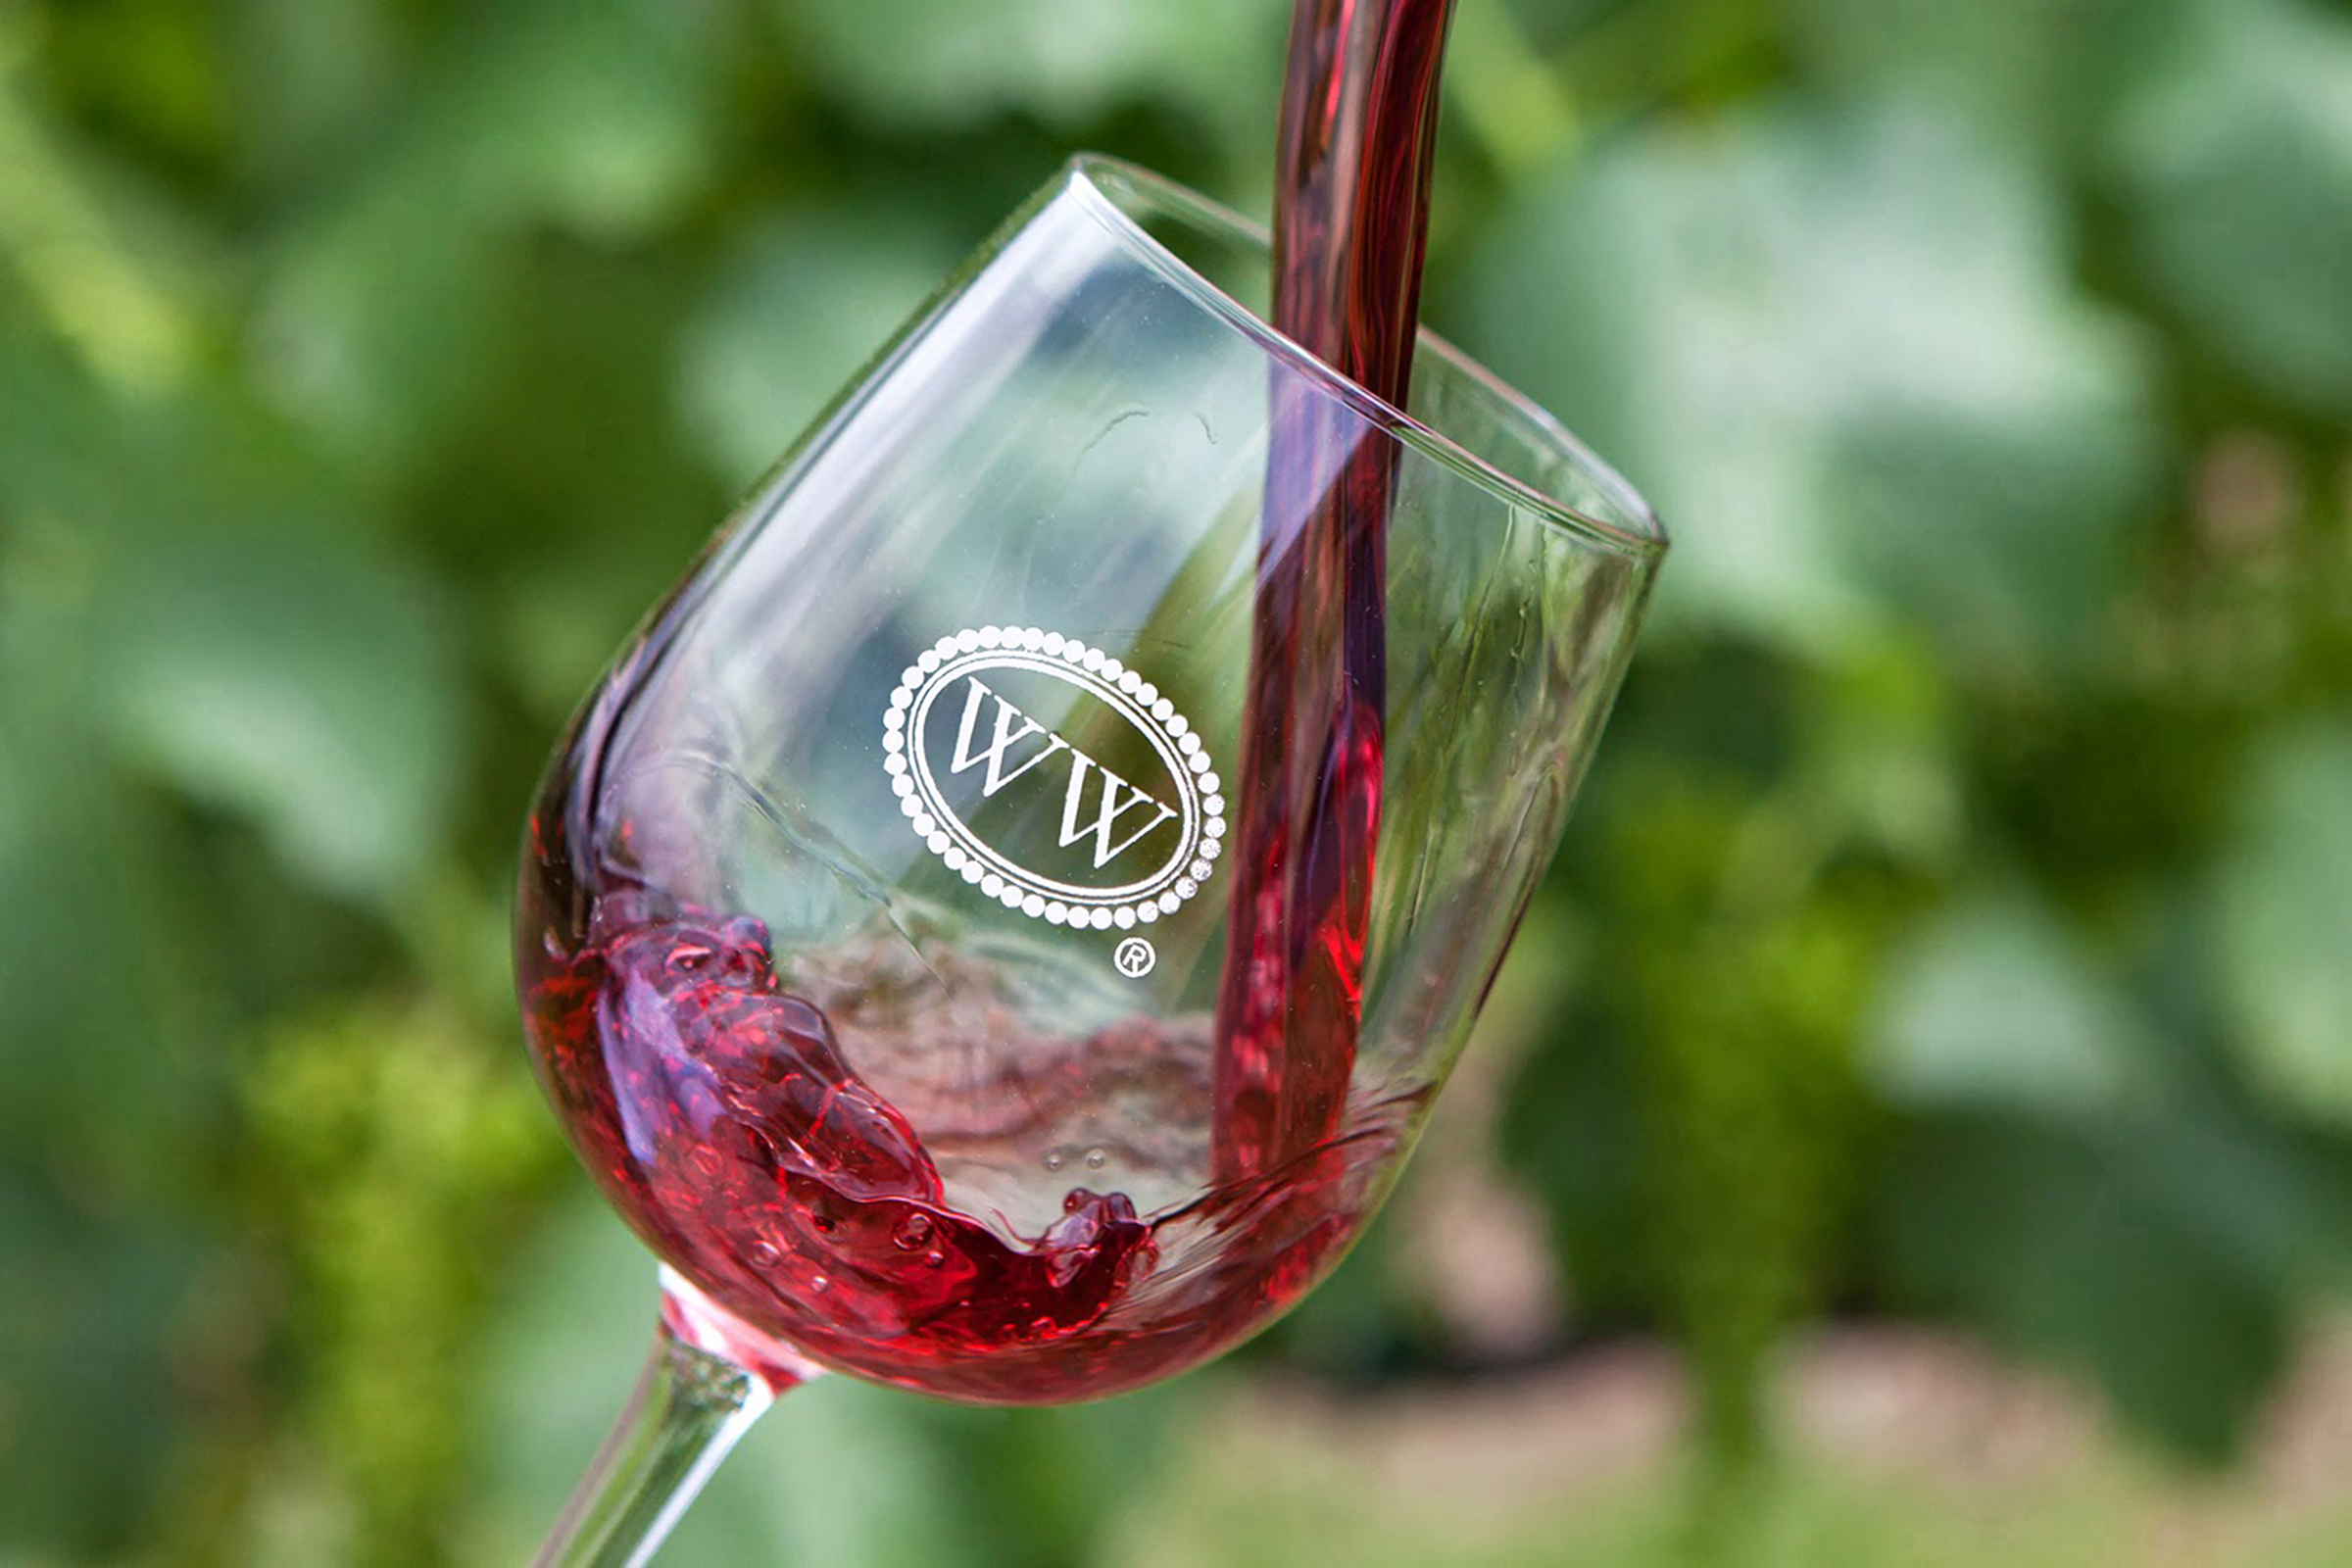 The Williamsburg Winery Wine Glass